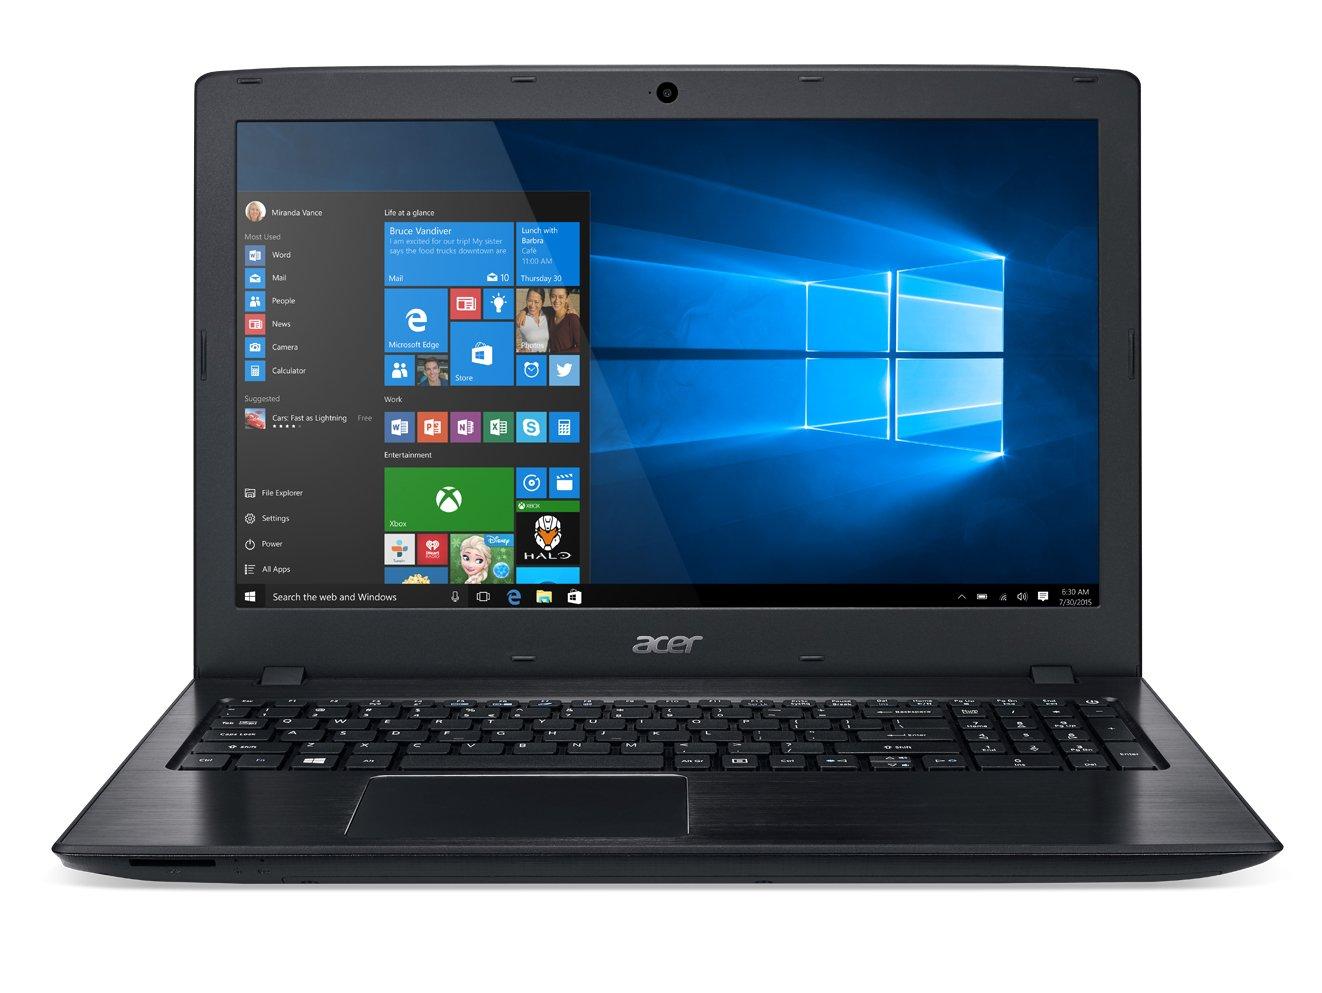 Acer Aspire E 15 E5-575G-76YK 15.6-inch Full HD Notebook (Intel Core i7, NVIDIA 940MX, 8 GB DDR4, 256GB SSD, Windows 10 Home 64-bit Edition),Black